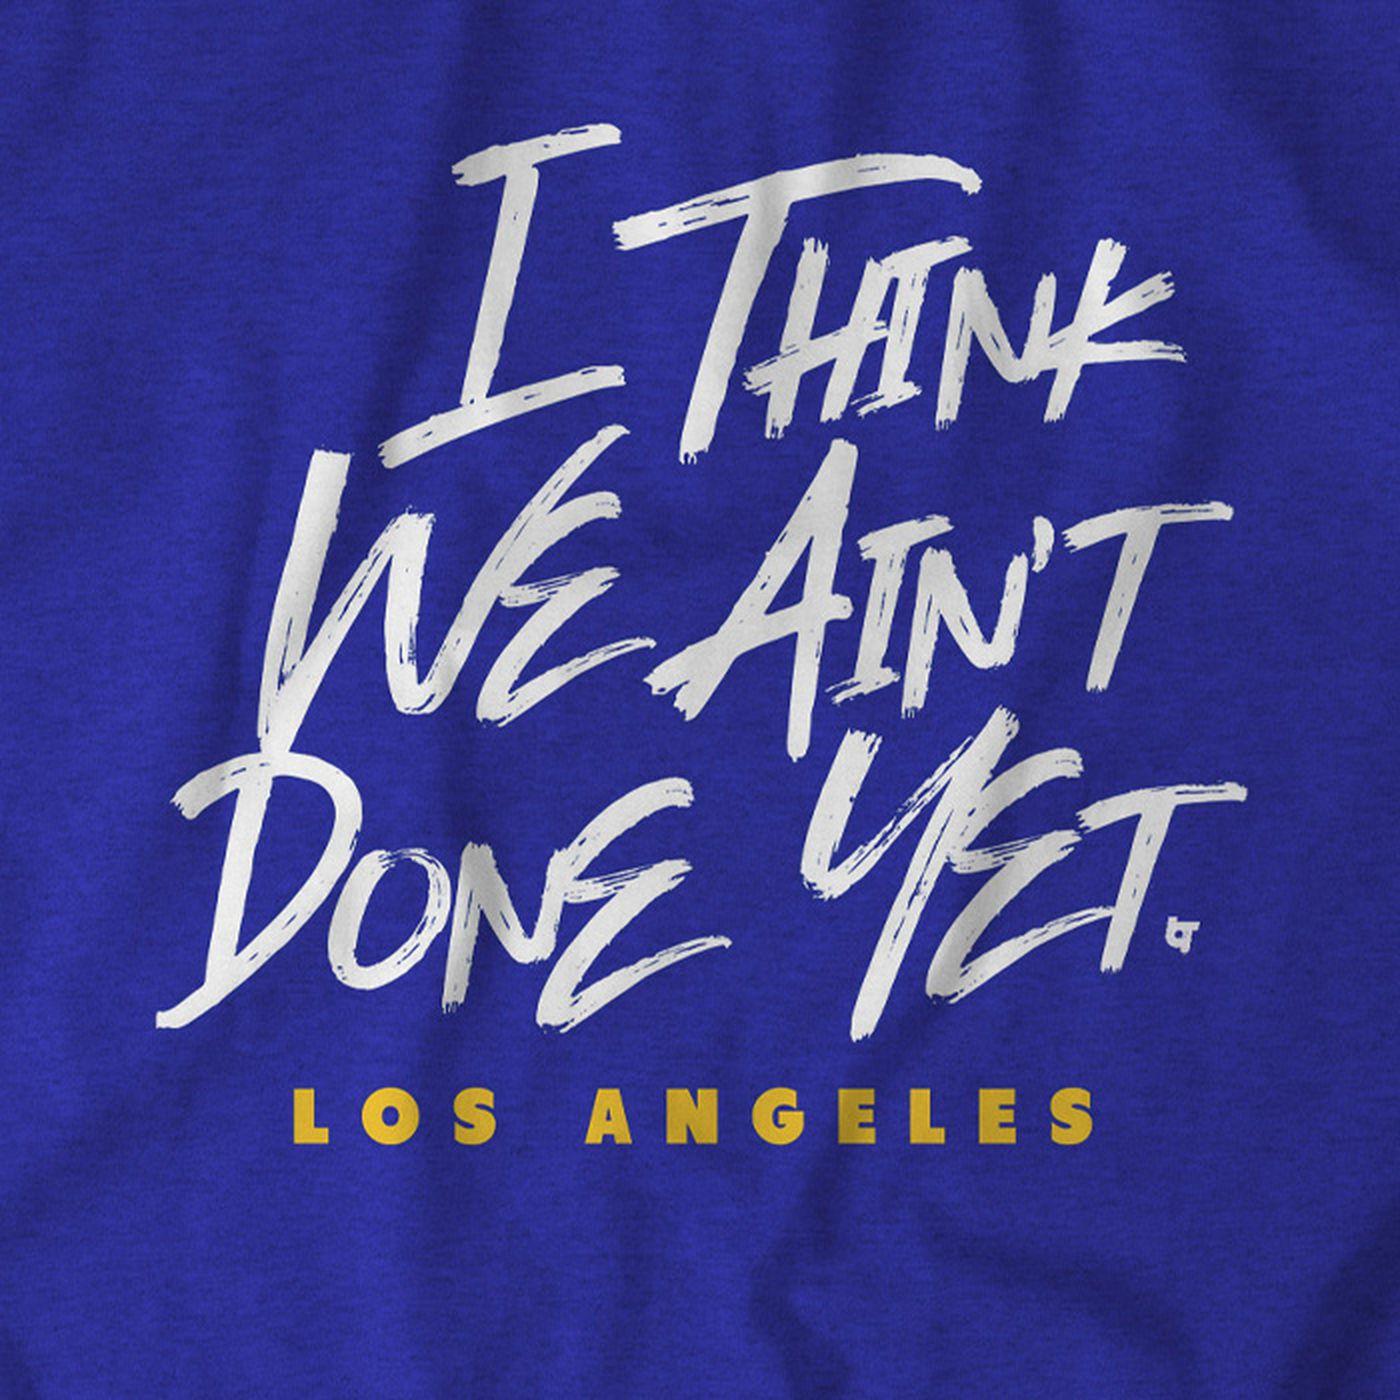 afa597a510631 New t-shirts celebrate LA Rams winning NFC Championship - Turf Show ...